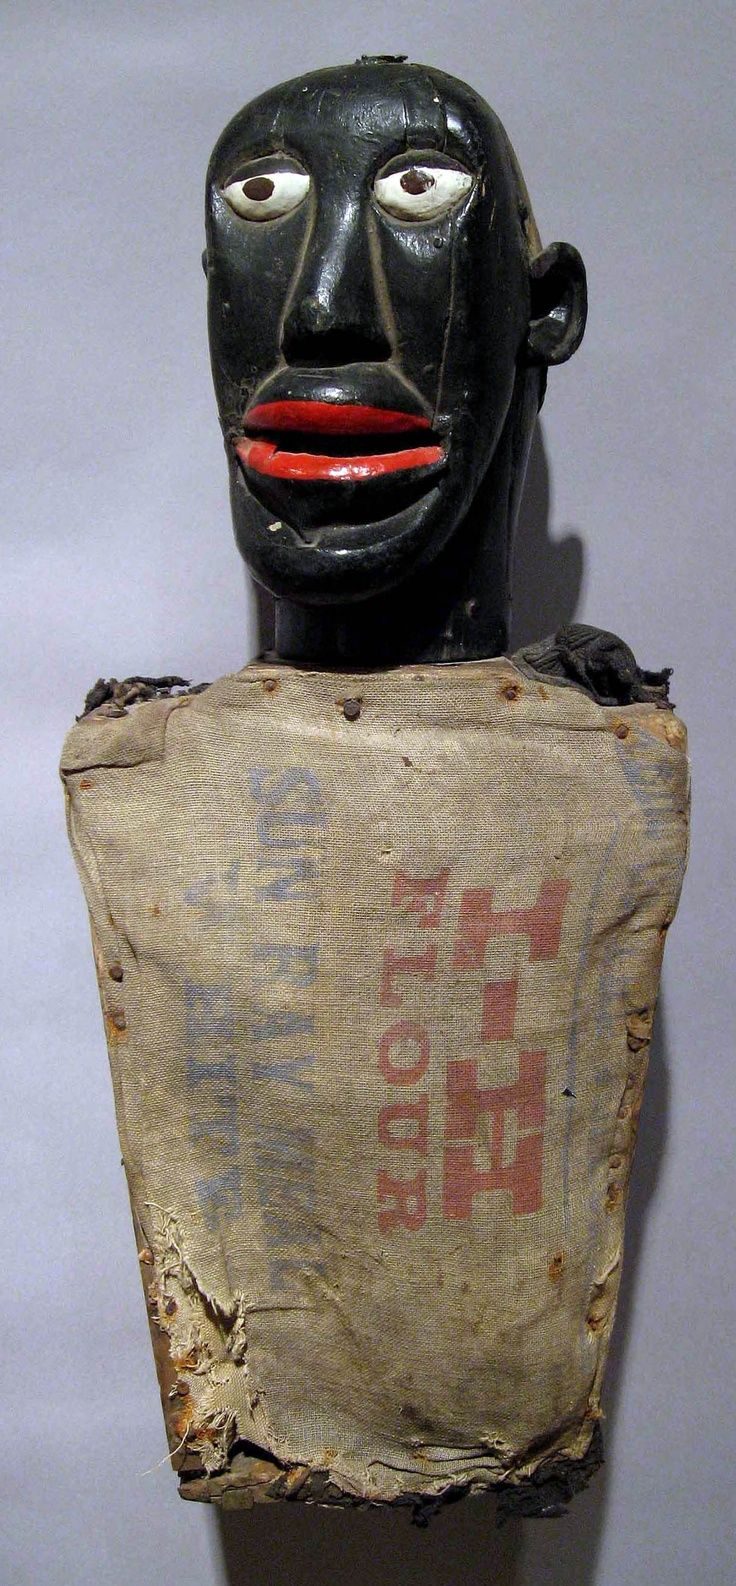 Ventriloquist's Minstrel Figure Artist Unknown Memphis, TN c. 1920 15.5 x 10 inches